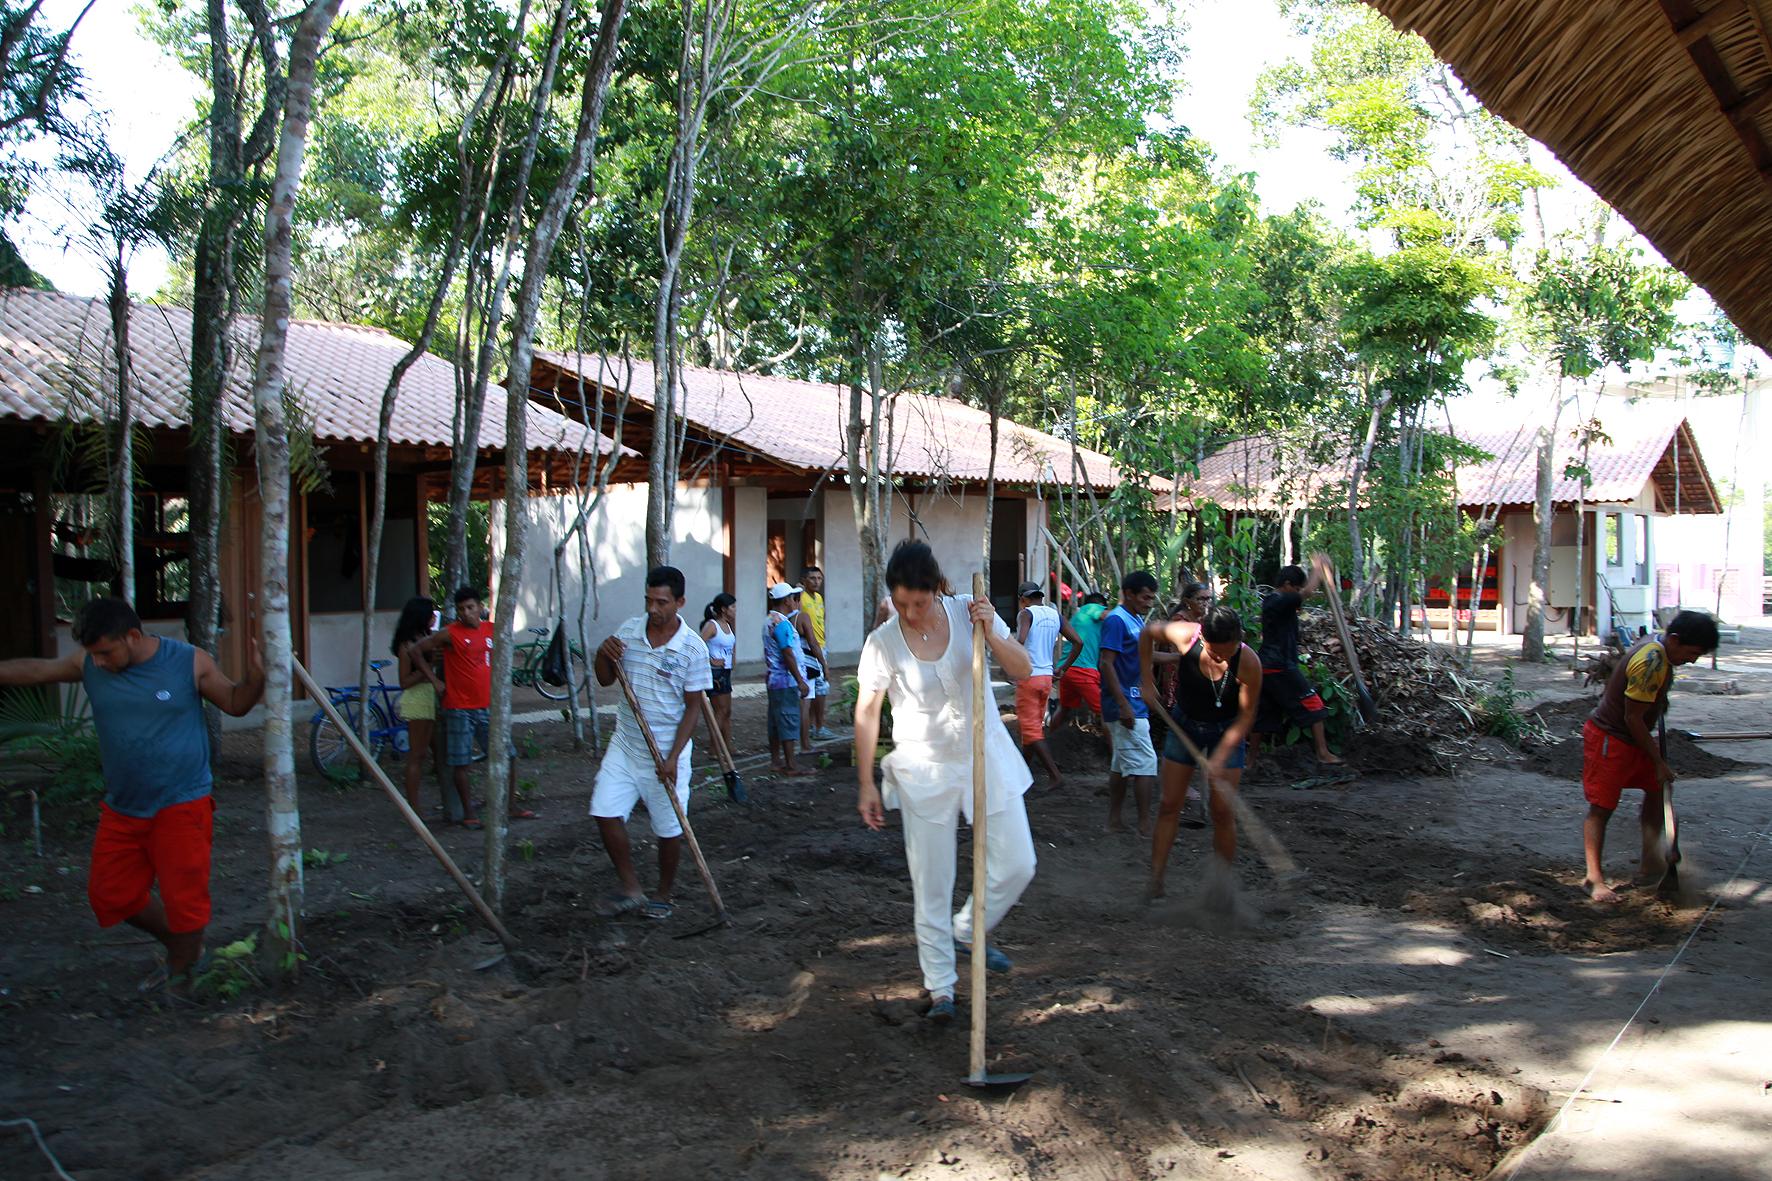 Centro Experimental Floresta Ativa